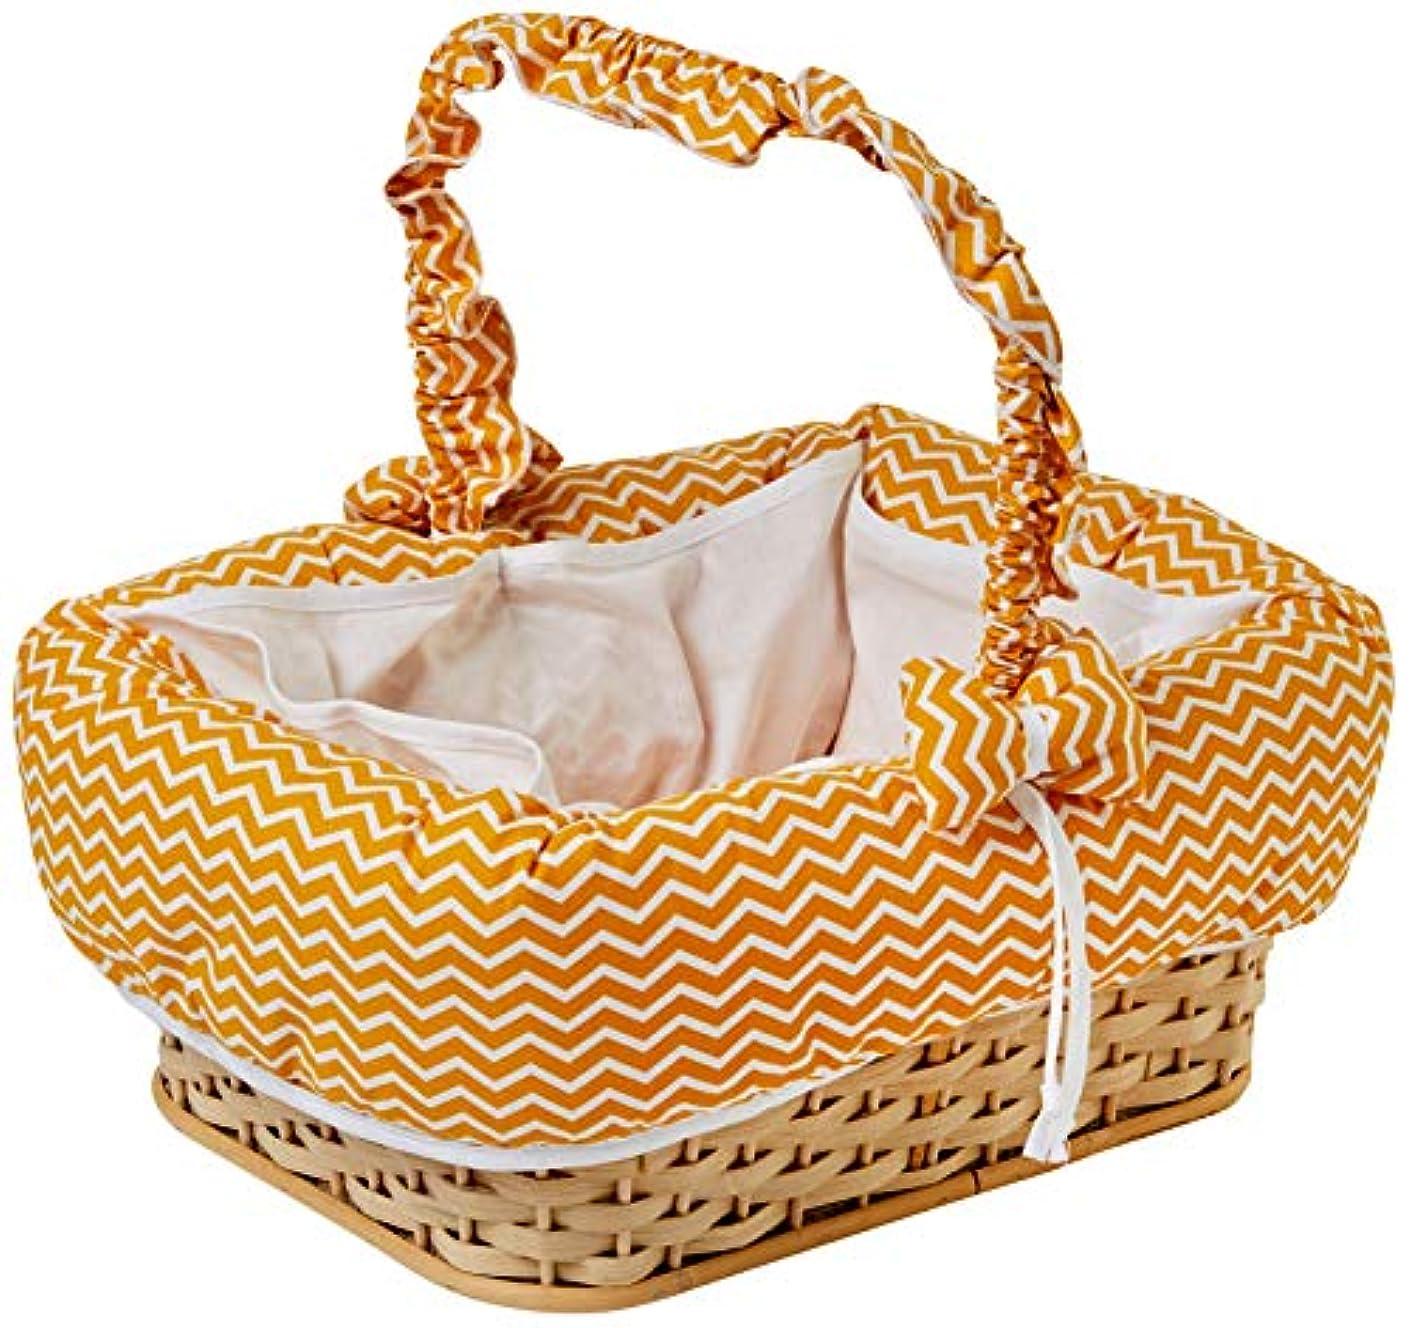 Italbaby Zigzag Rectangular Beauty Basket, Saffron/Natural, Multi-Color, One Size